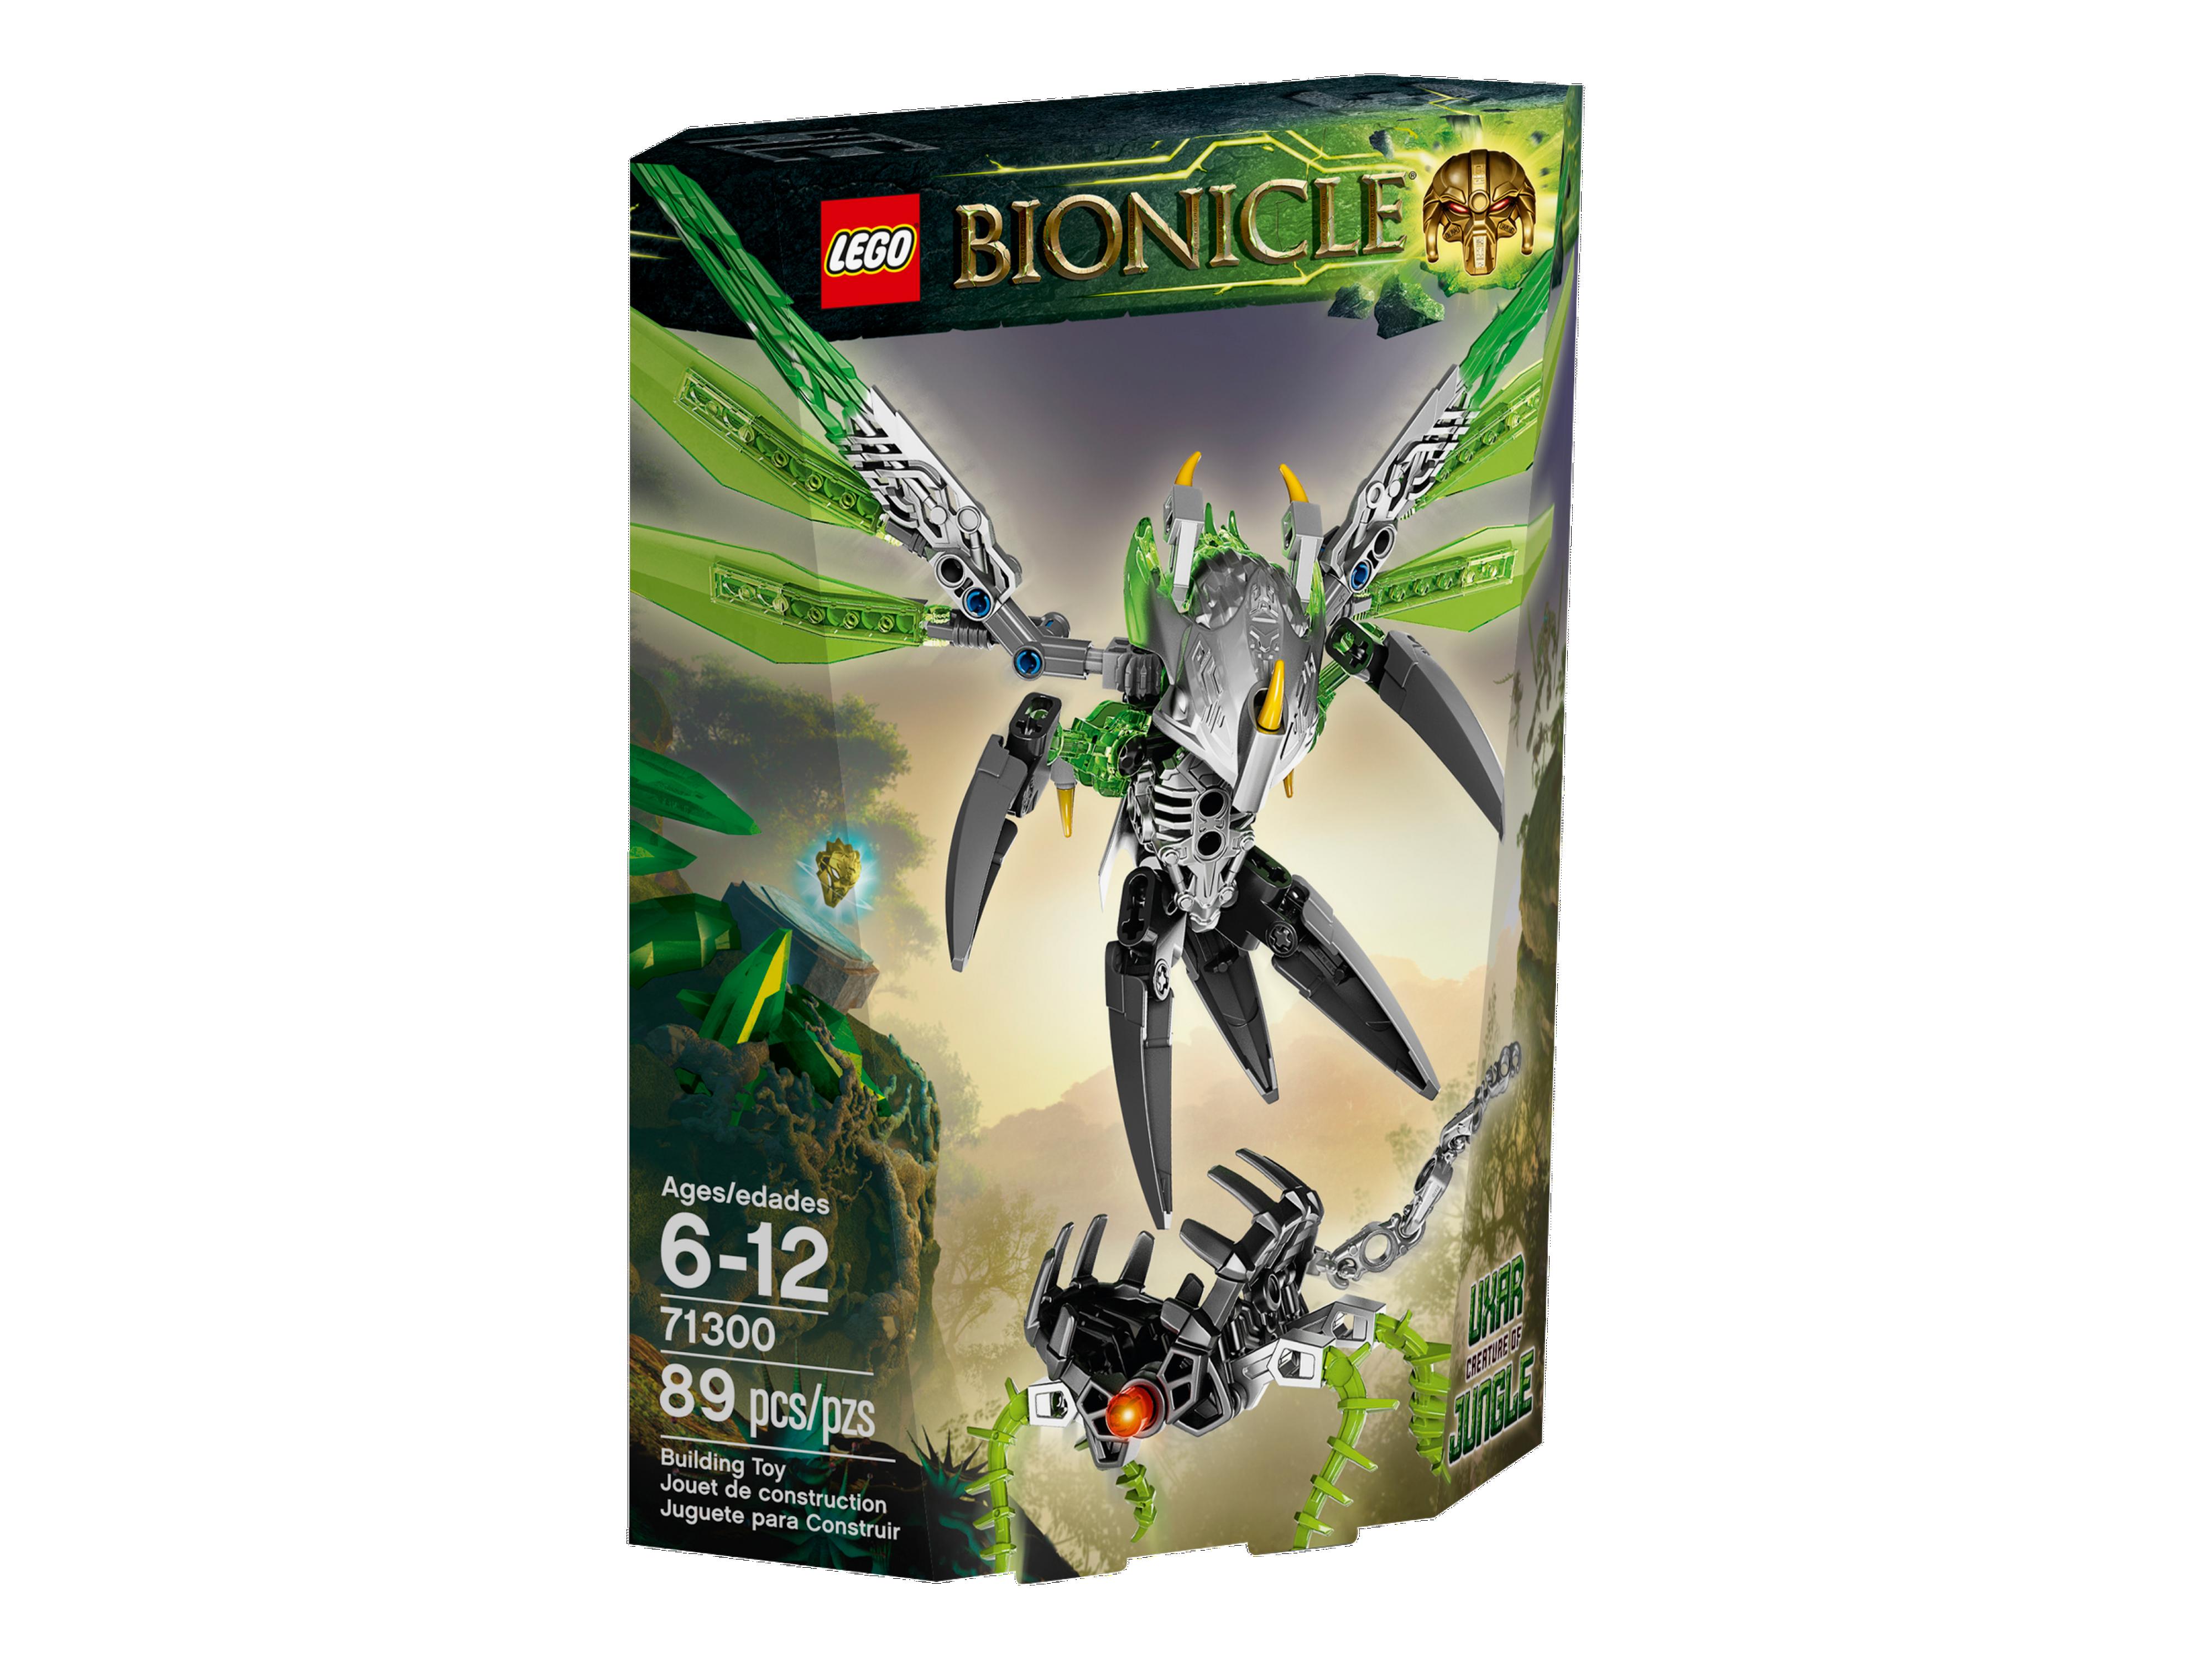 71300 Uxar – Creature of Jungle